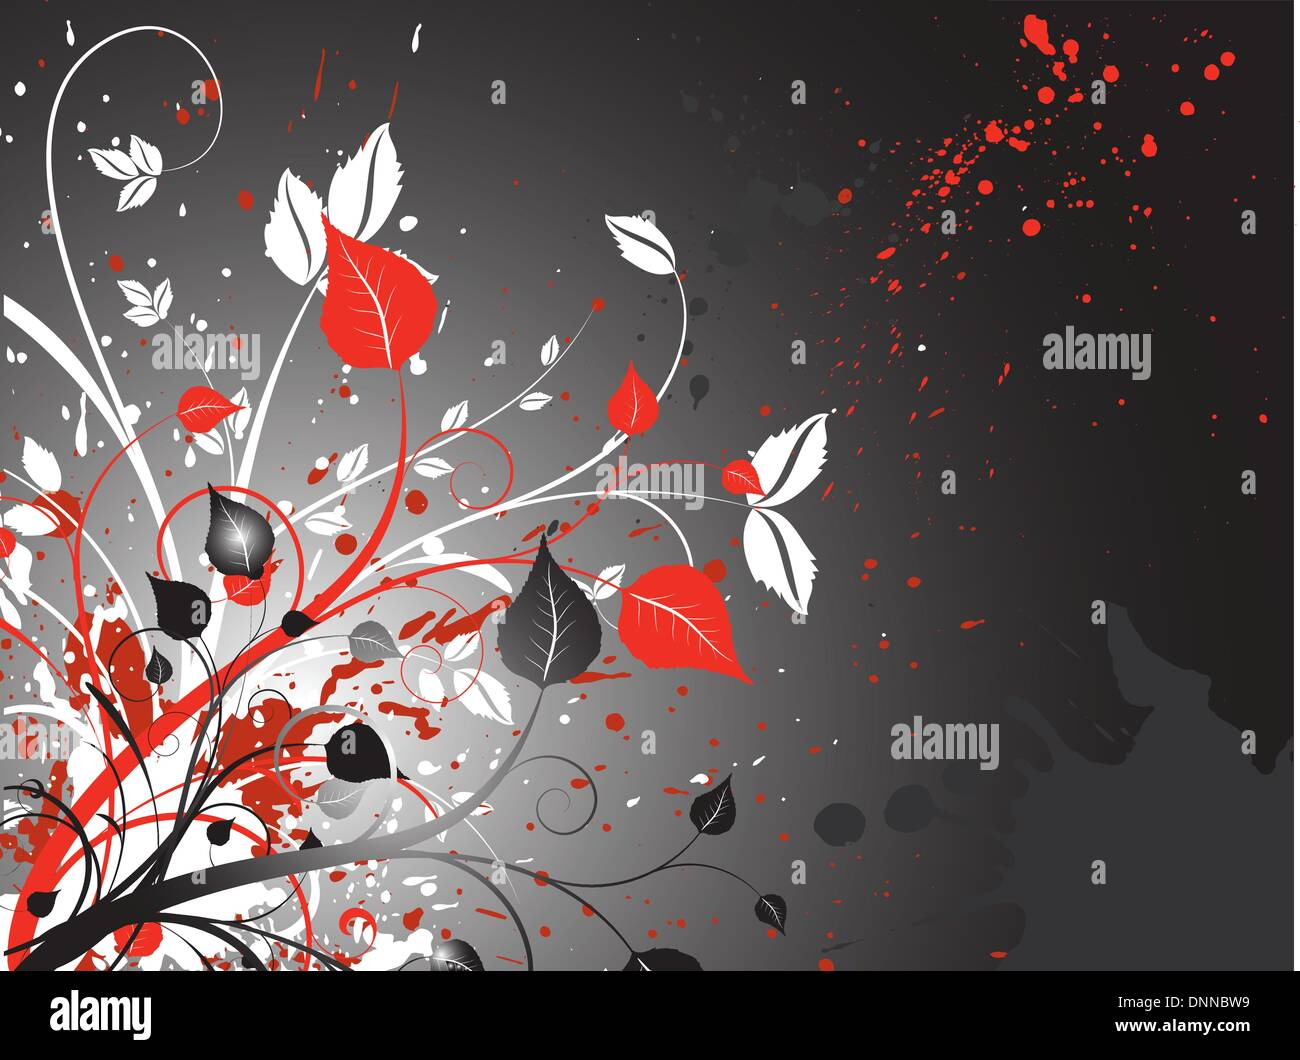 Floral grunge background - Stock Image